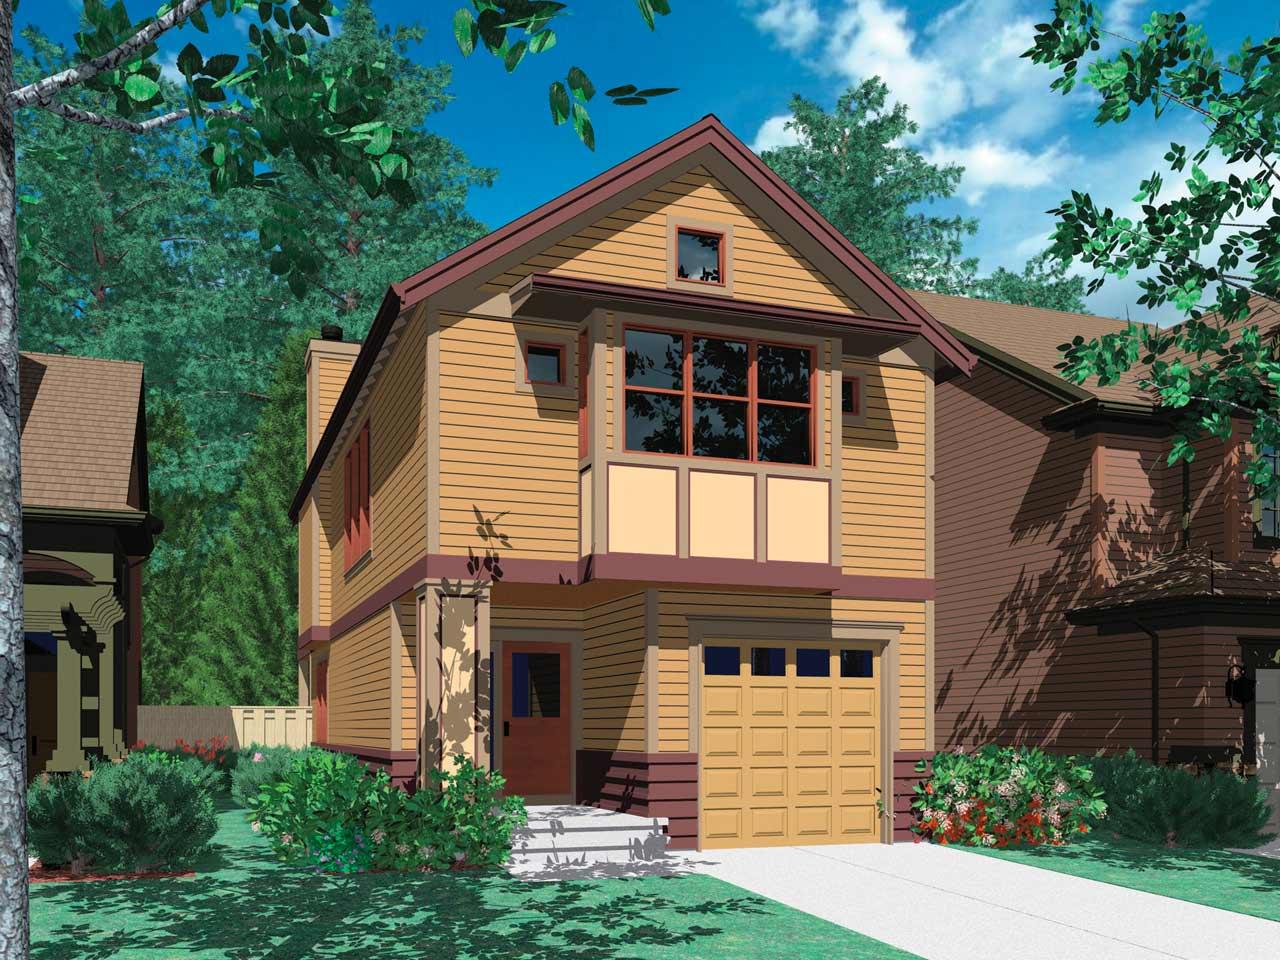 Craftsman Style Floor Plans Plan: 74-282